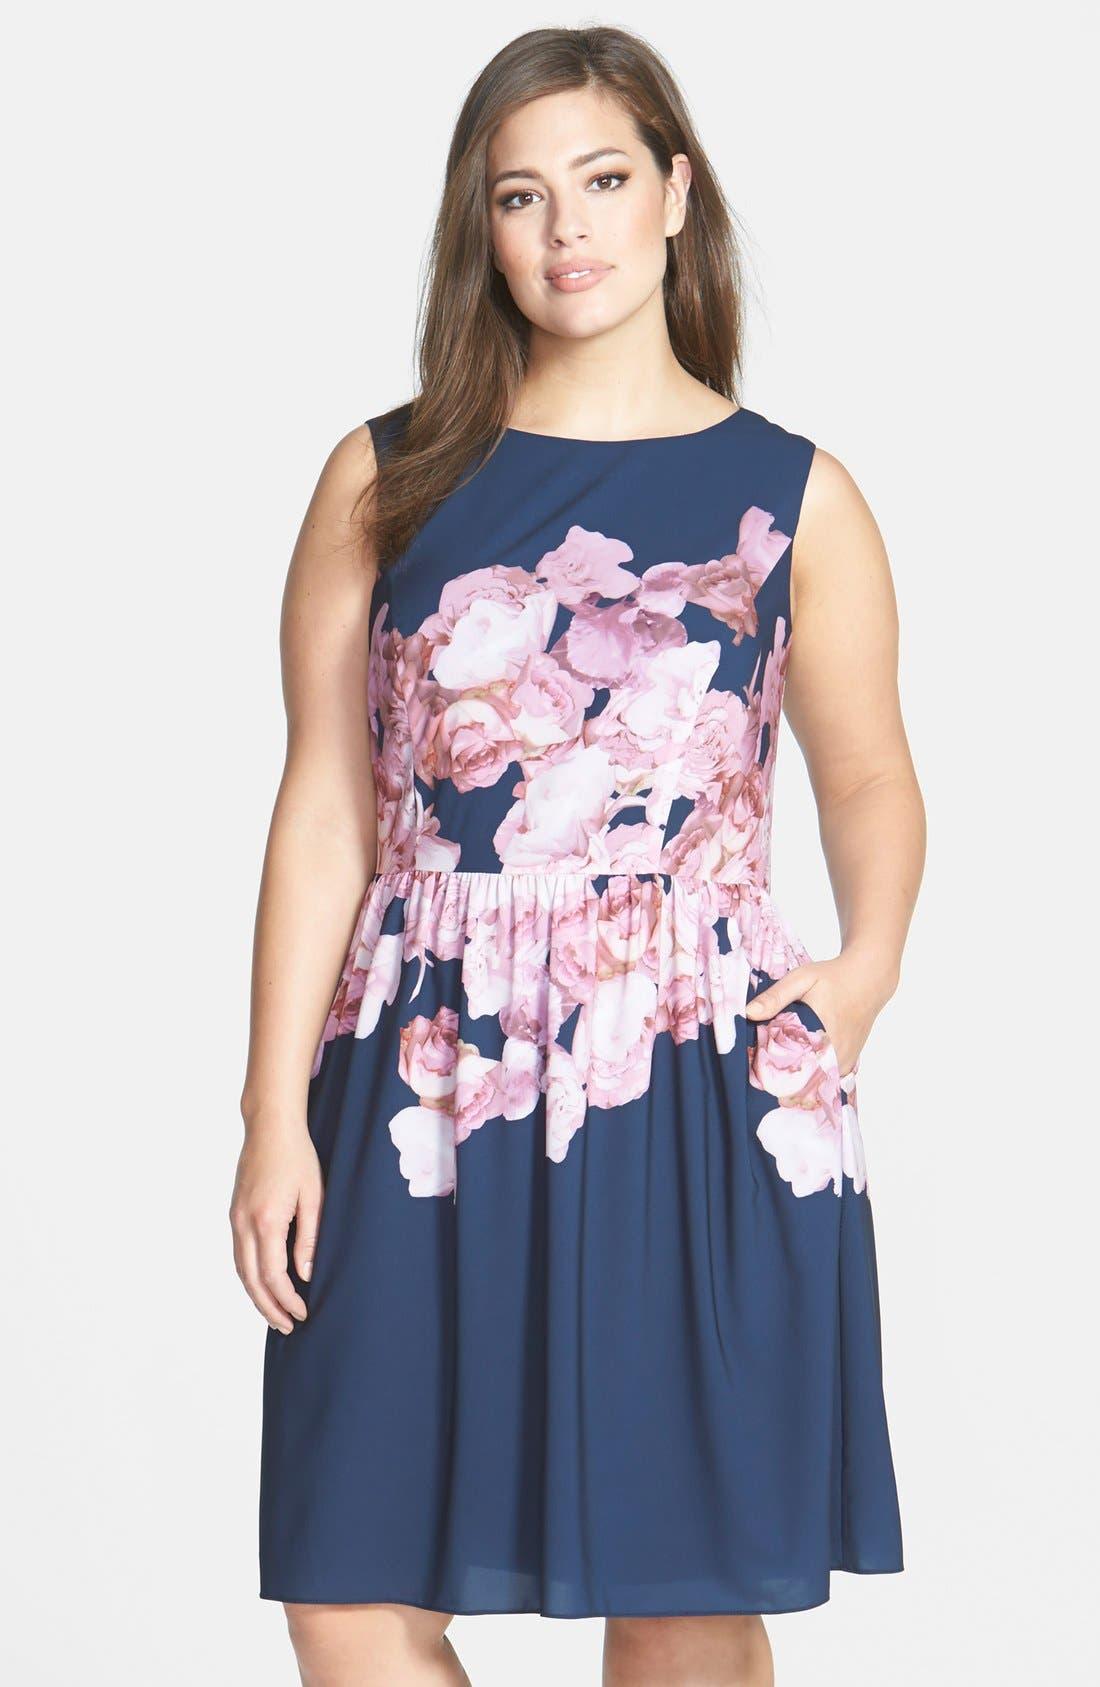 Floral Print Chiffon Fit & Flare Dress,                             Main thumbnail 1, color,                             463